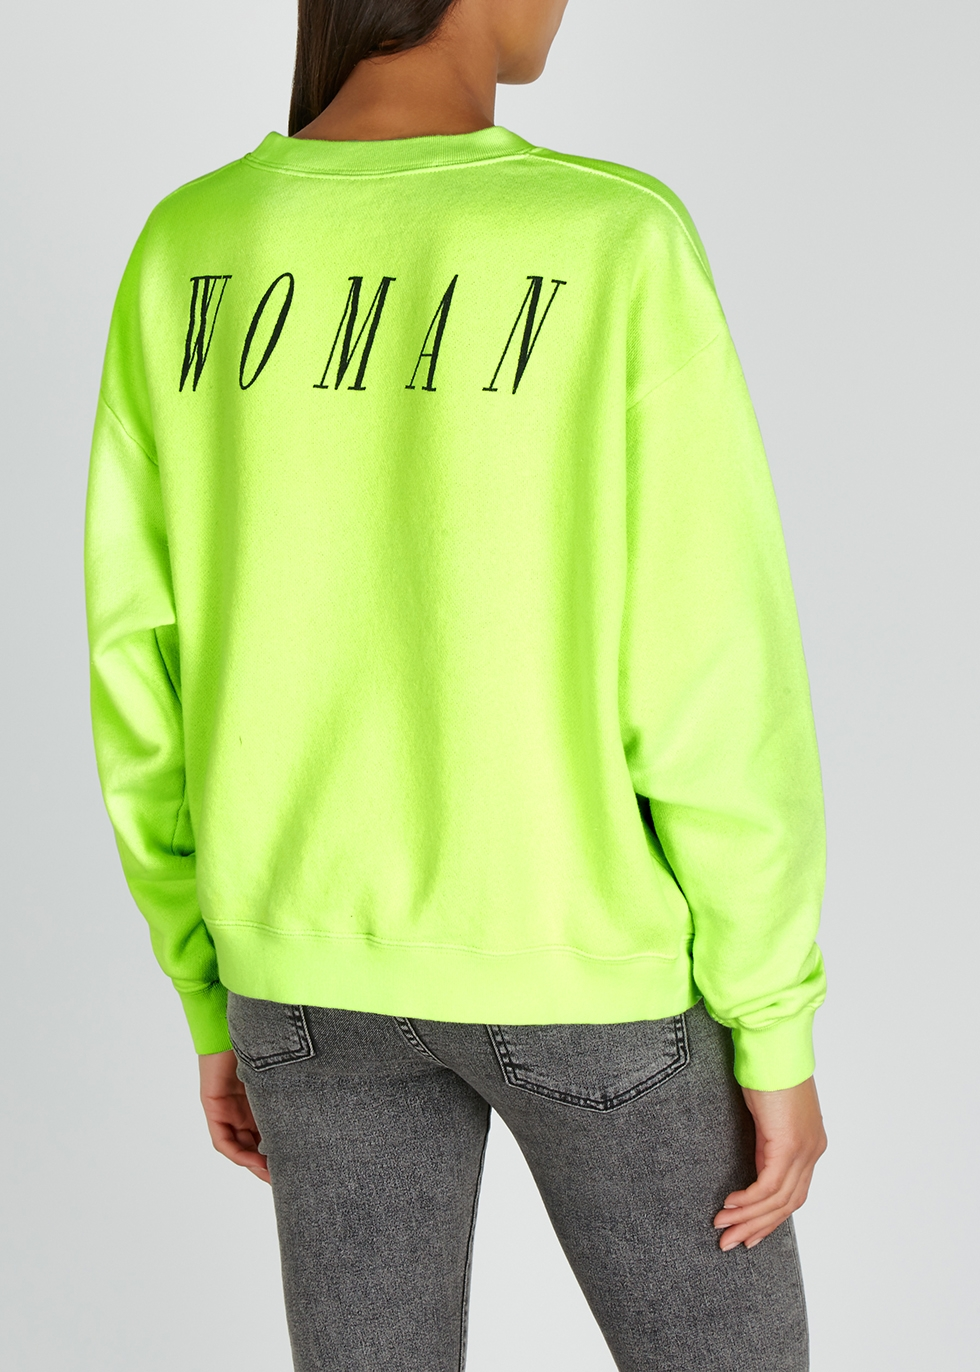 Neon green printed cotton sweatshirt - Off-White